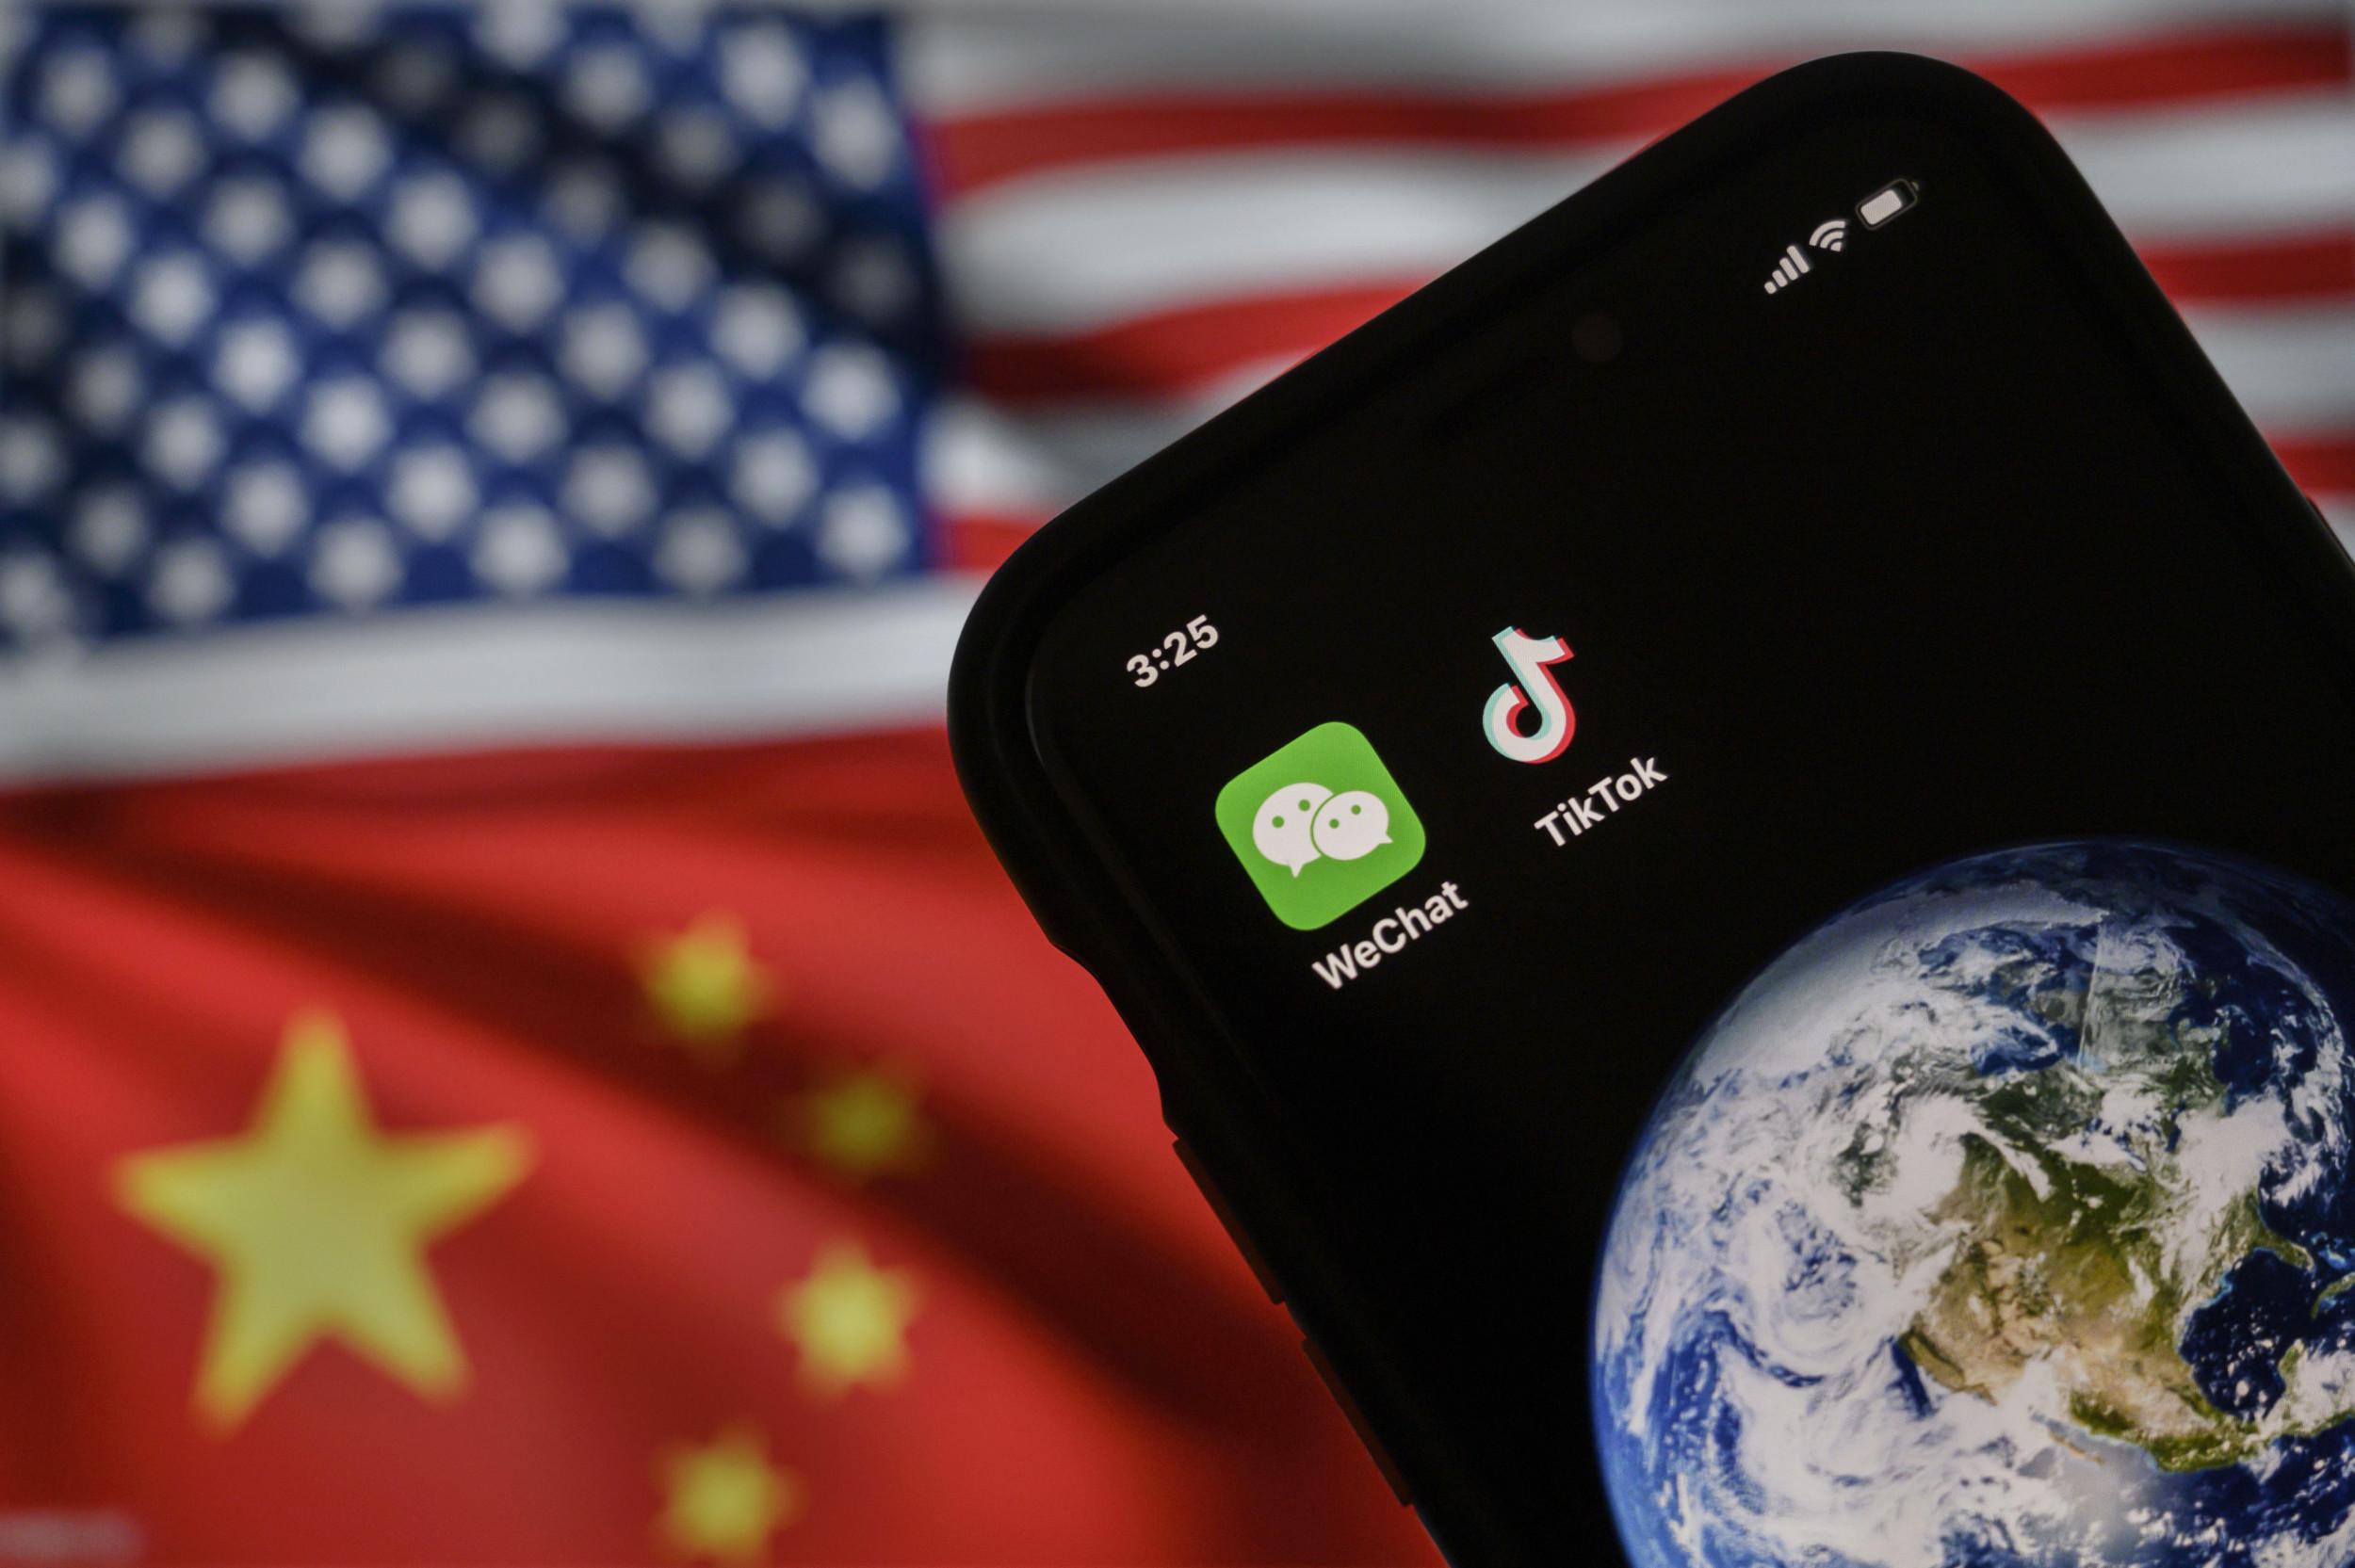 China Calls U.S. 'Real Eavesdropping Empire' After Ban on Chinese Companies